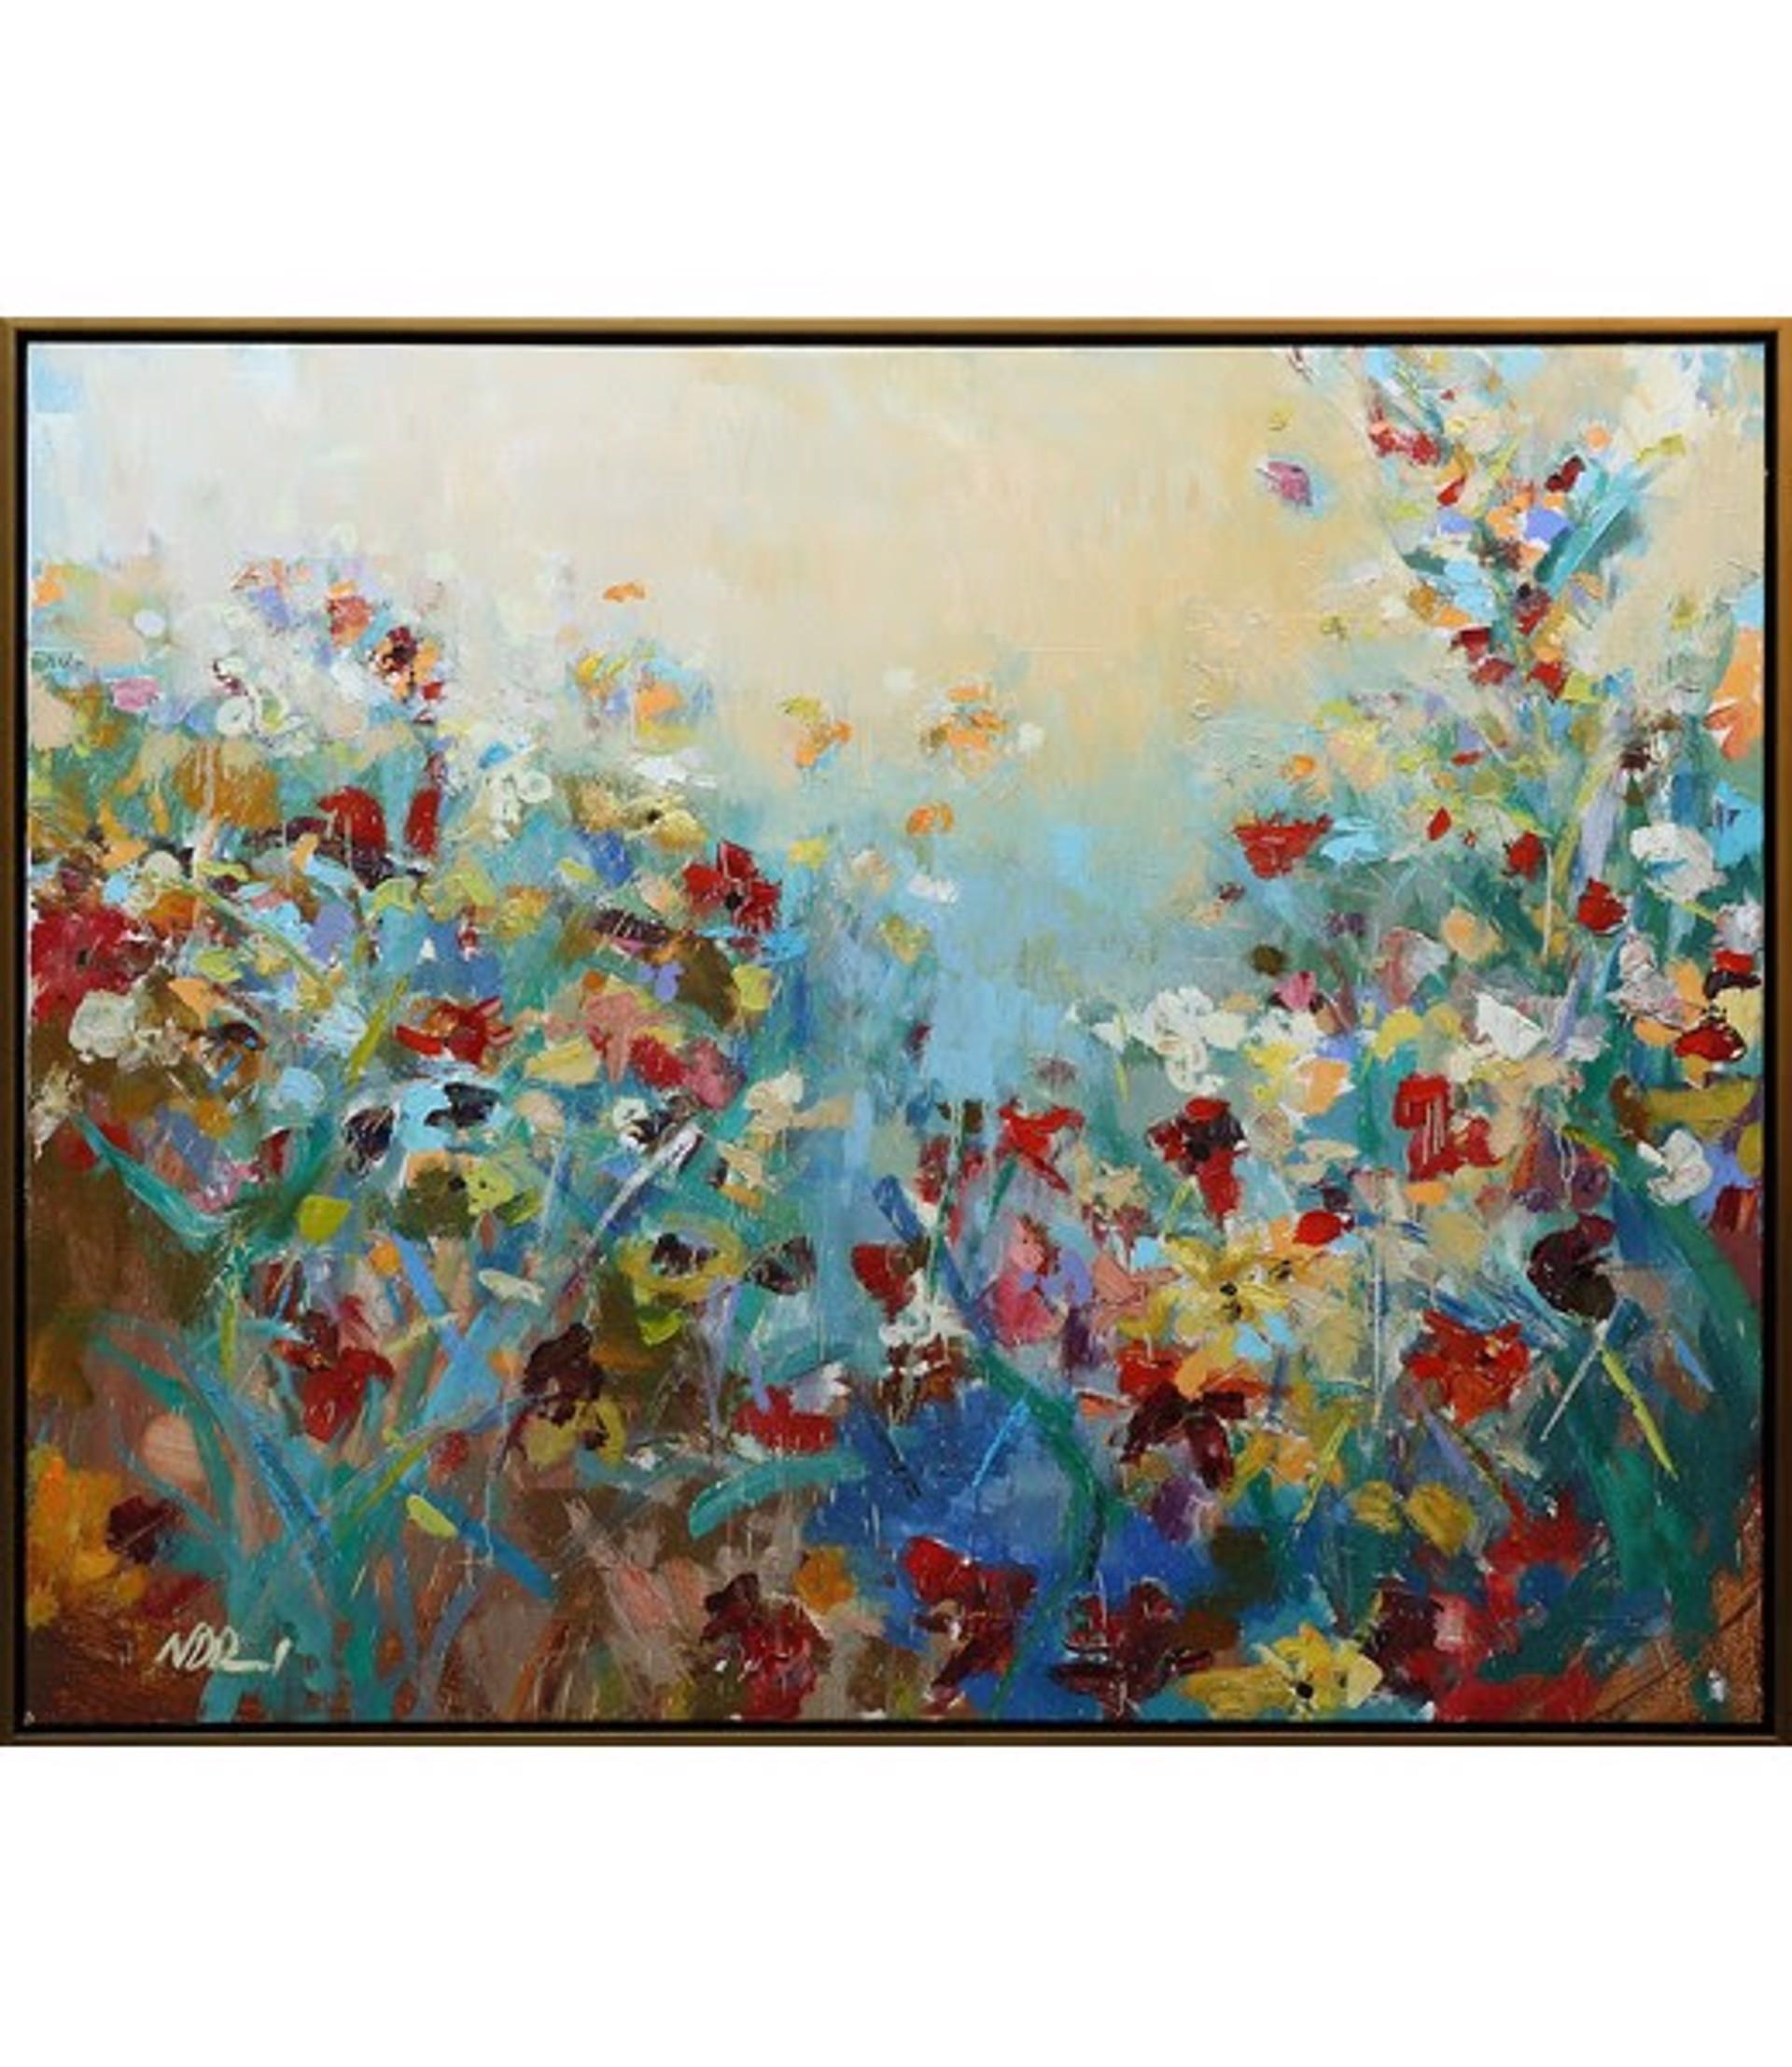 Natures Bloom by Noah Desmond